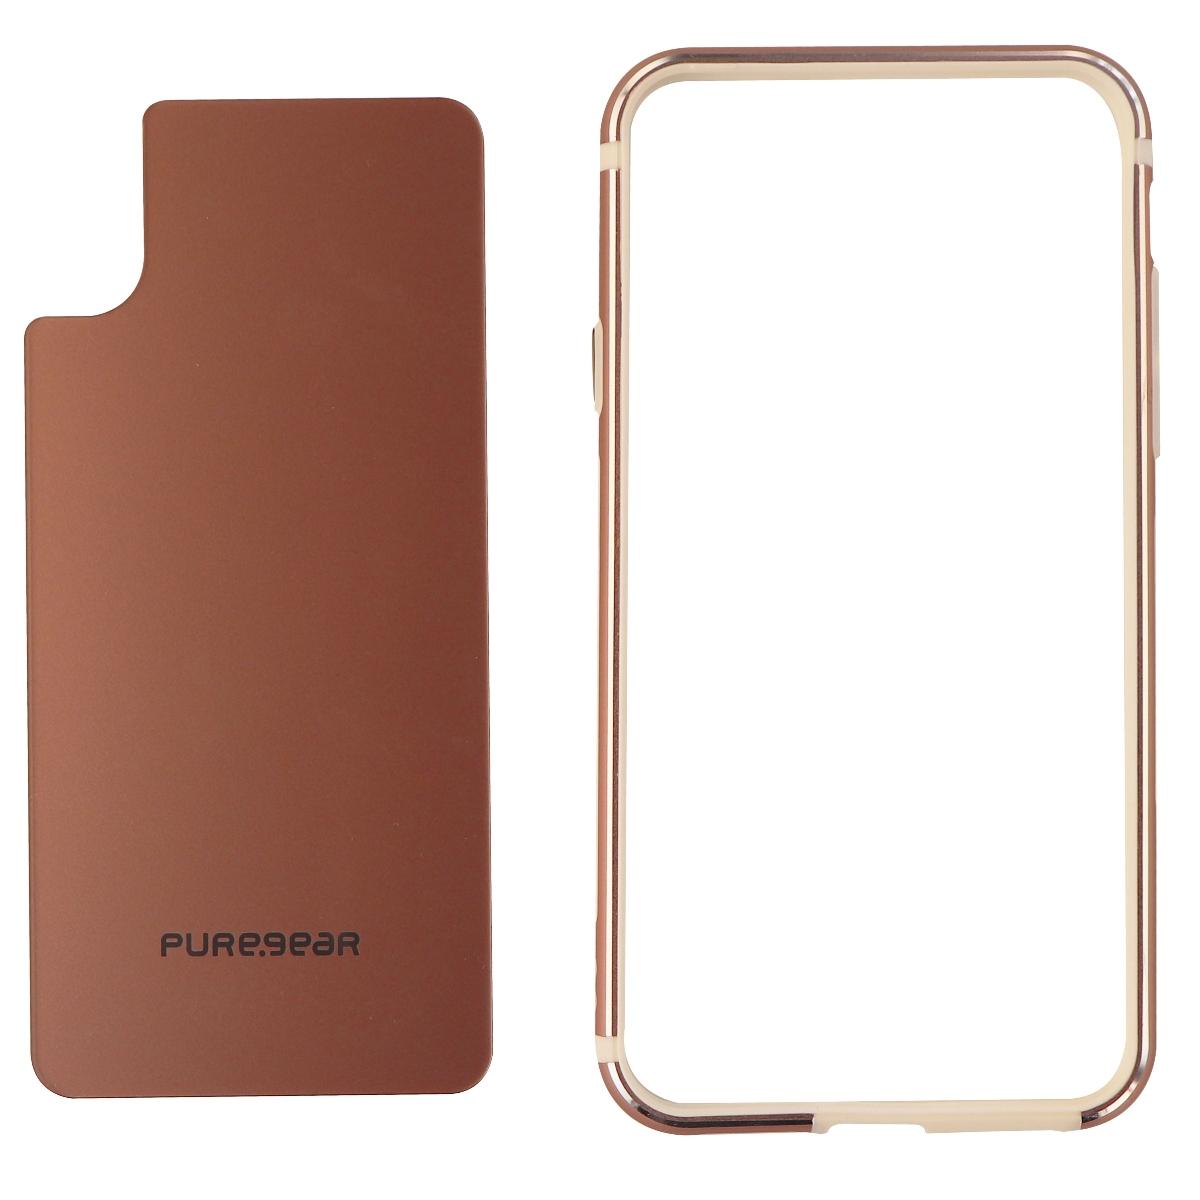 PureGear GlassBak 360 Metal Bumper and Glass Back for iPhone X 10 Pink Rose Gold